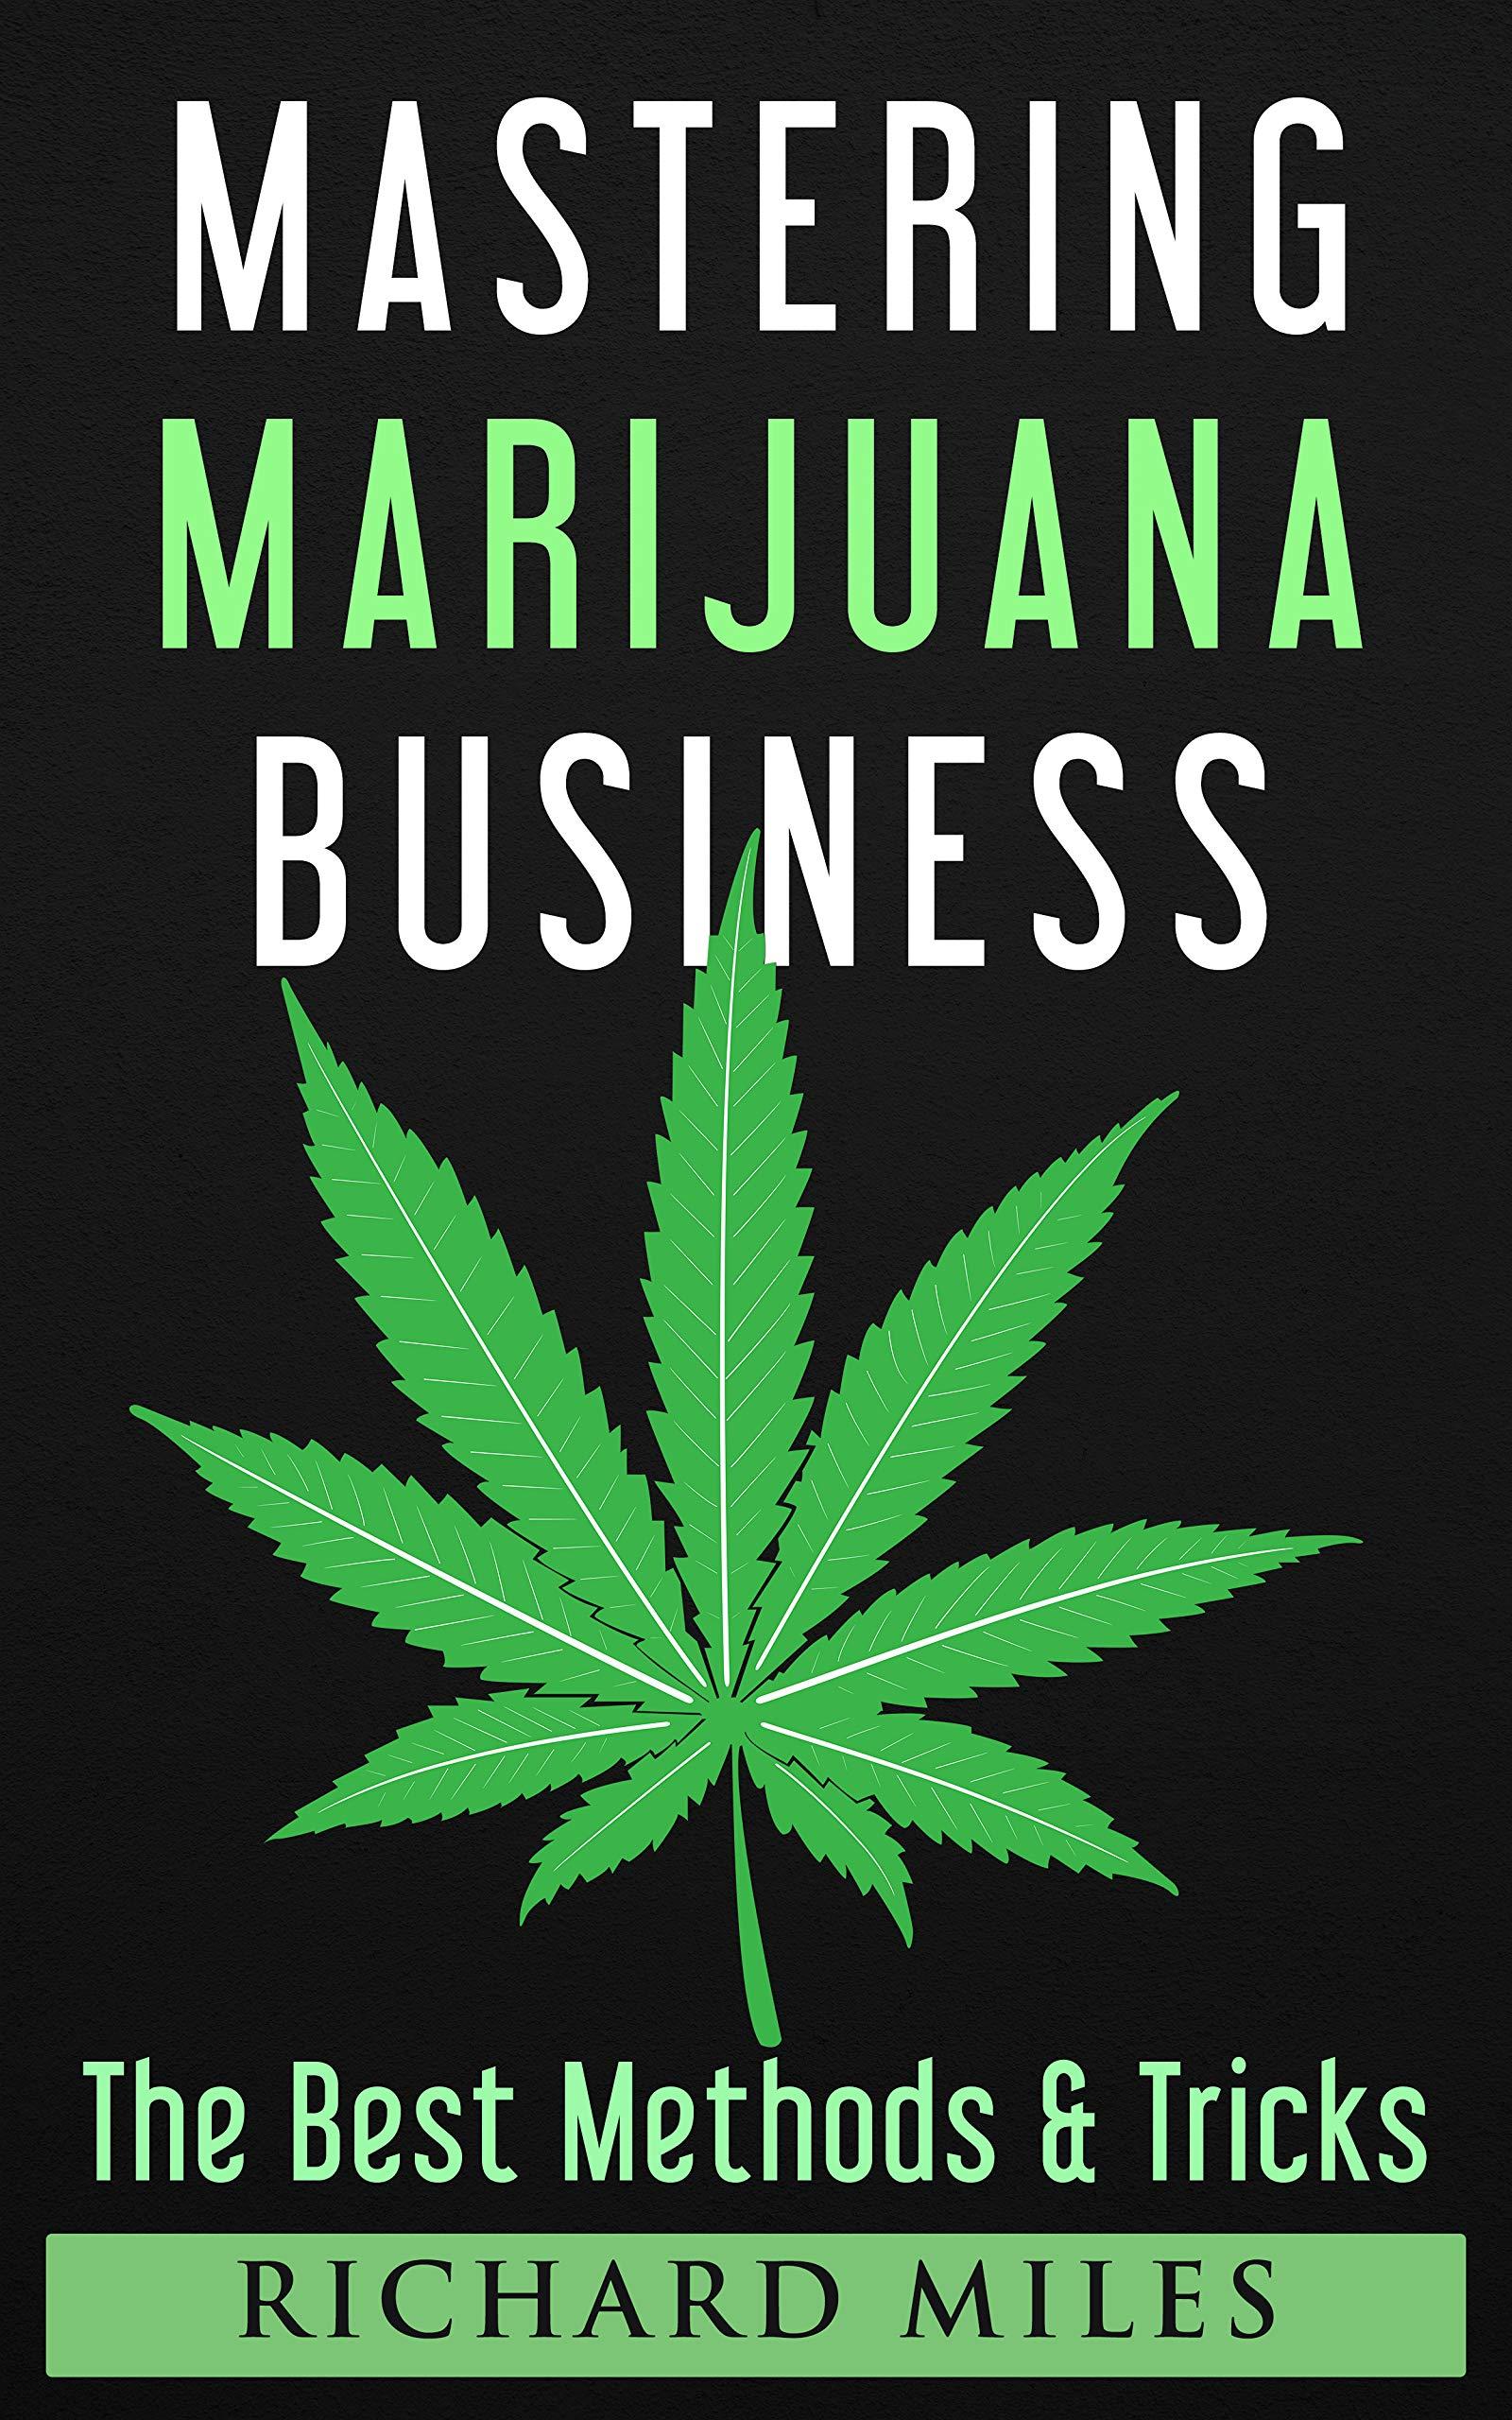 Mastering Marijuana Business - The Best Methods & Tricks for Successful Marijuana Business